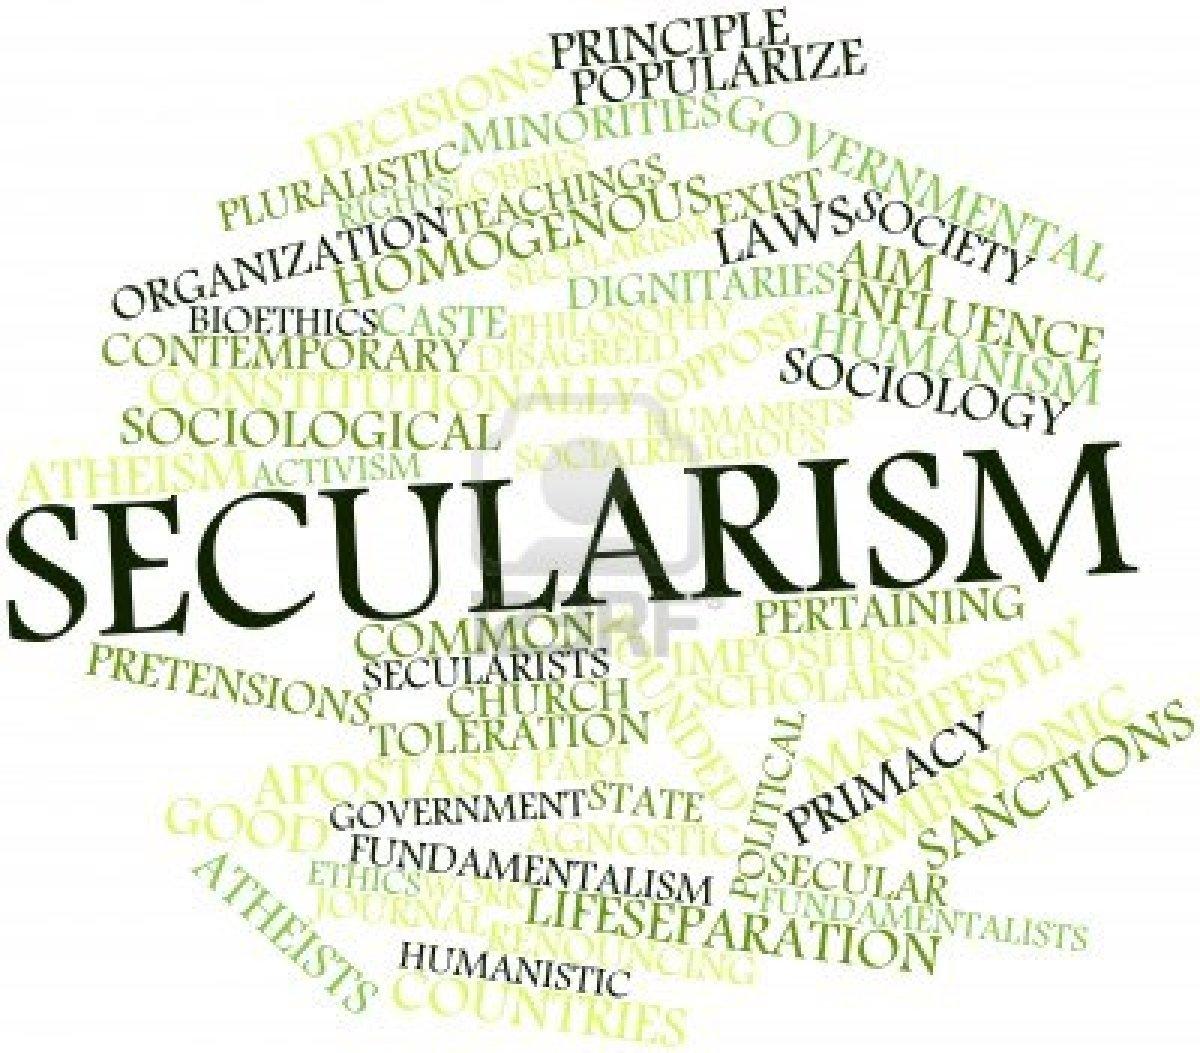 Secularism in state